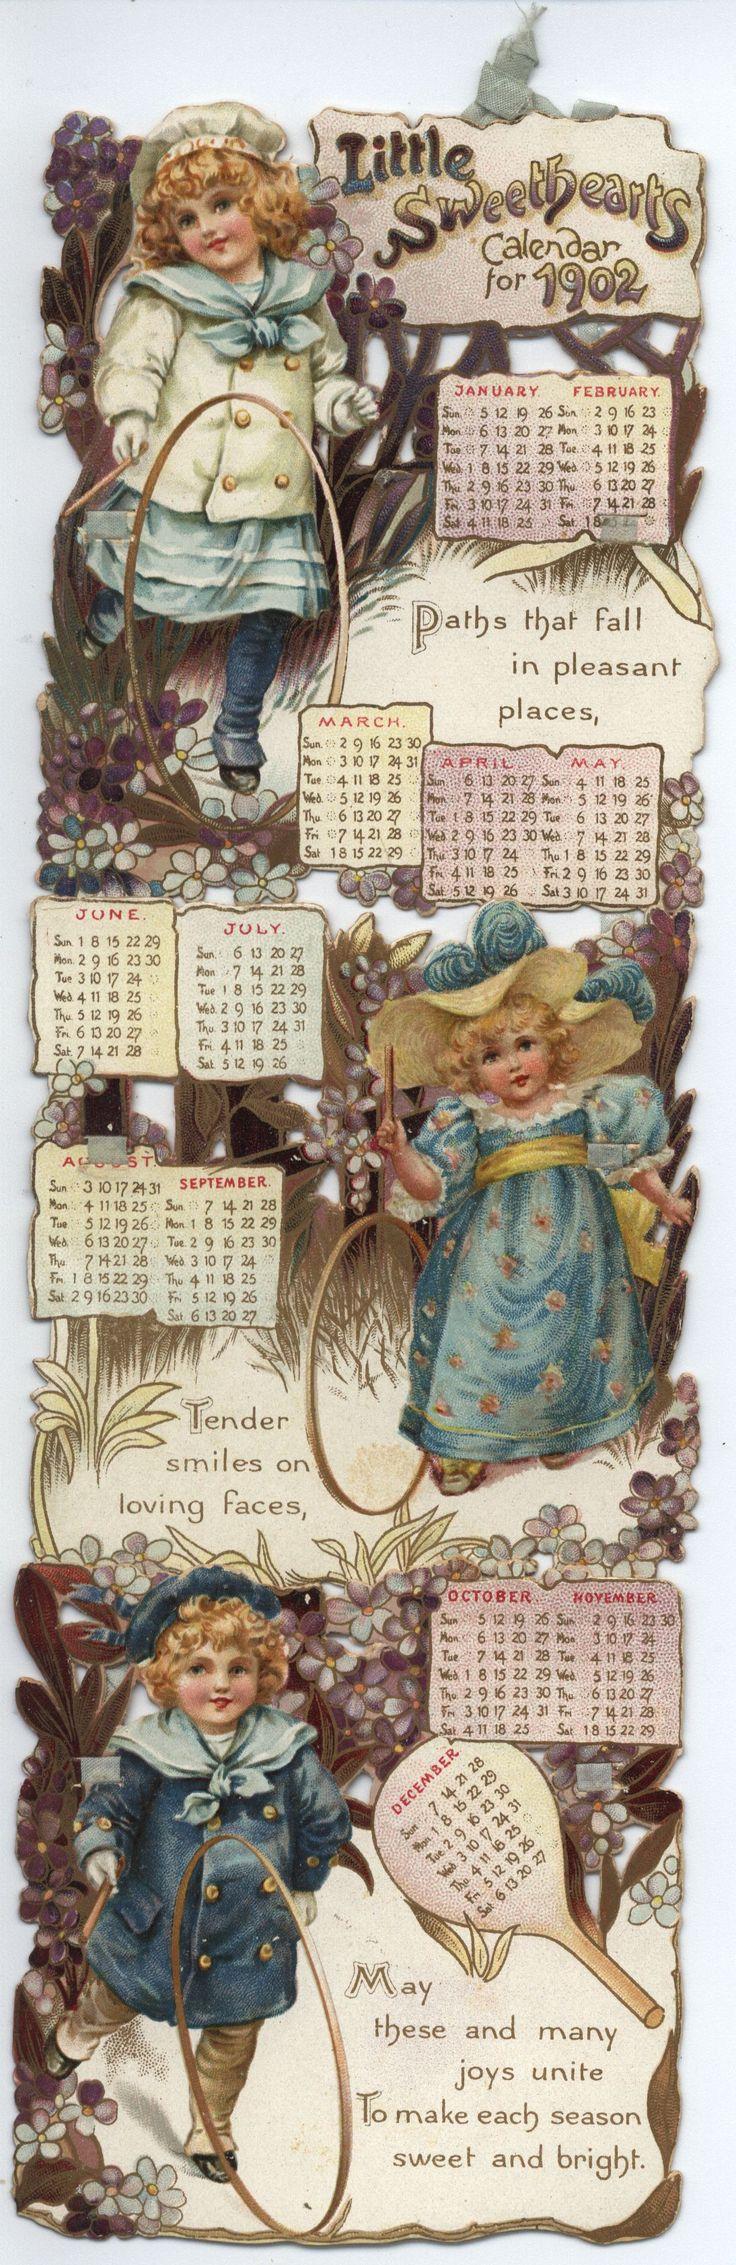 Full Sized Image: LITTLE SWEETHEARTS CALENDAR FOR 1902 - TuckDB Ephemera